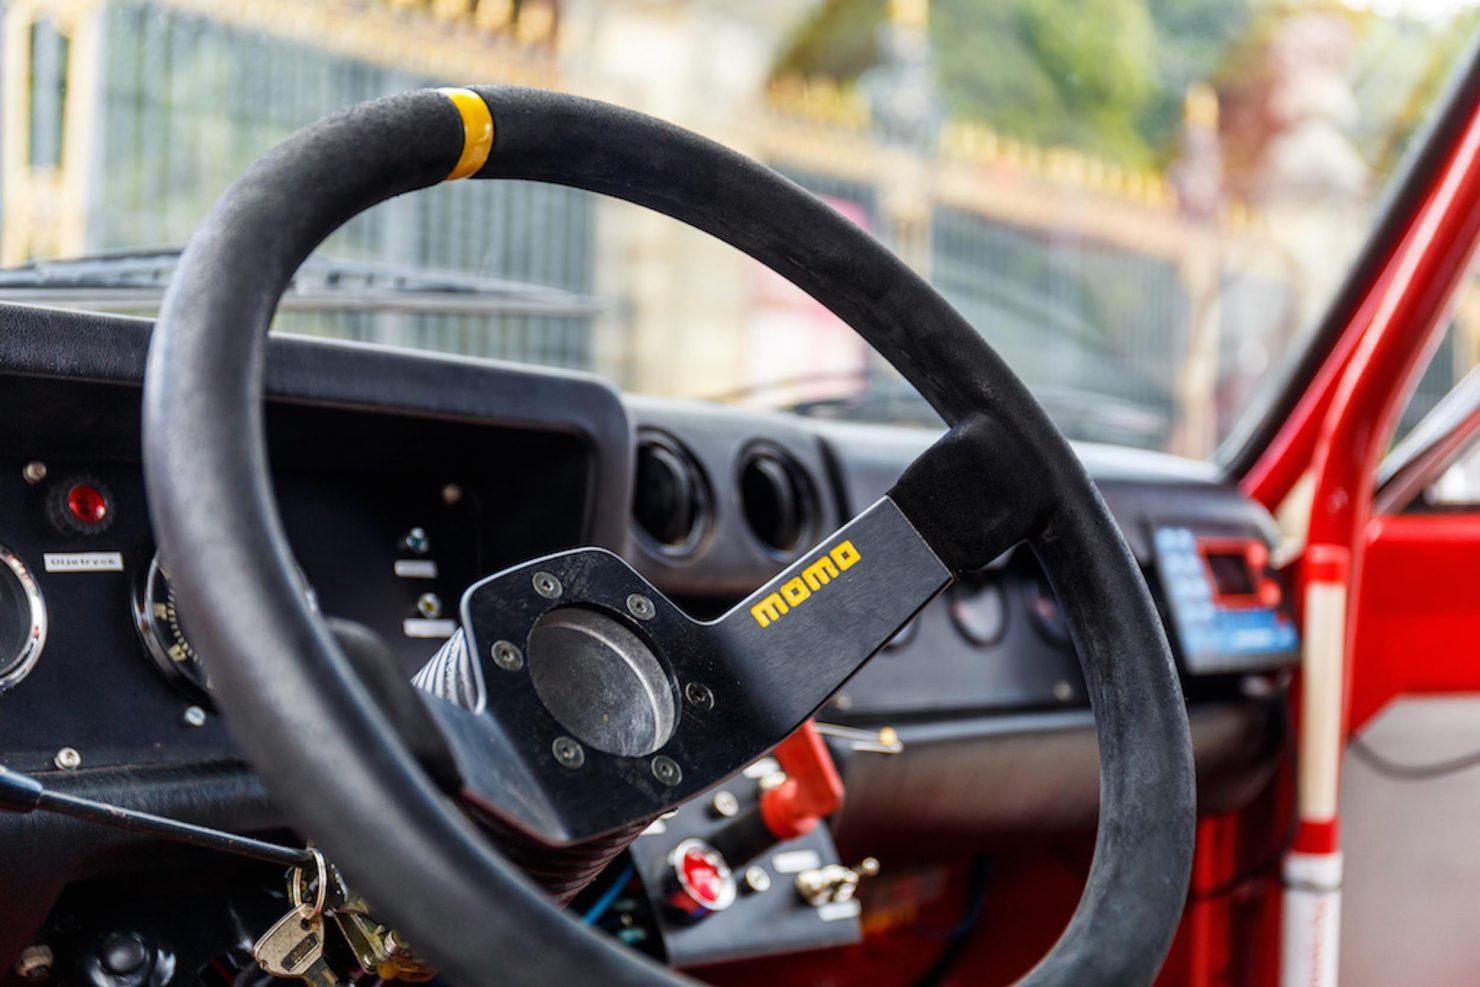 opel kadett rallye car 19 1480x987 - 1969 Opel Rallye Kadett